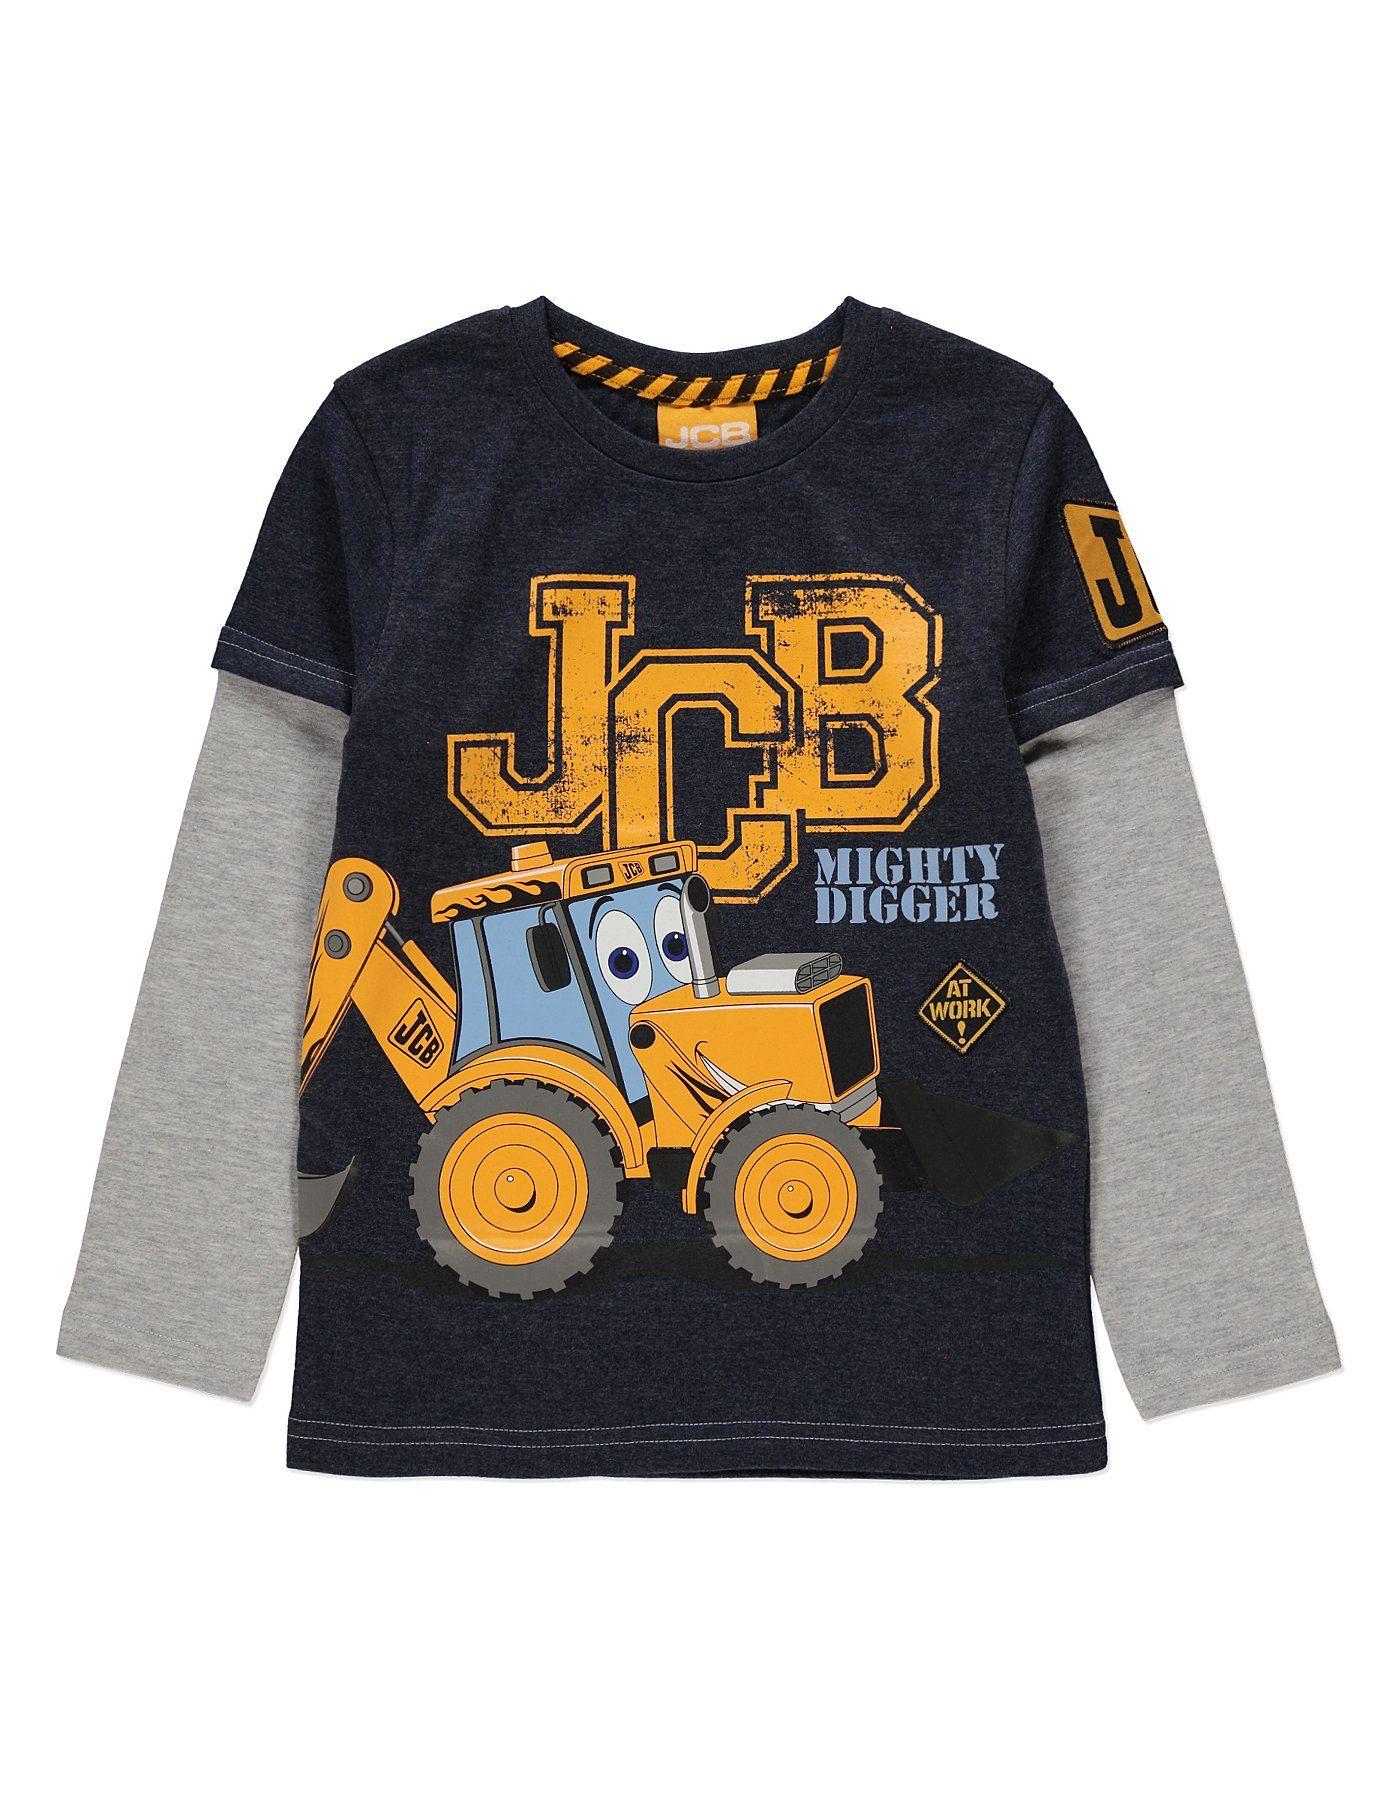 Black t shirt asda - Jcb Digger T Shirt Kids George At Asda